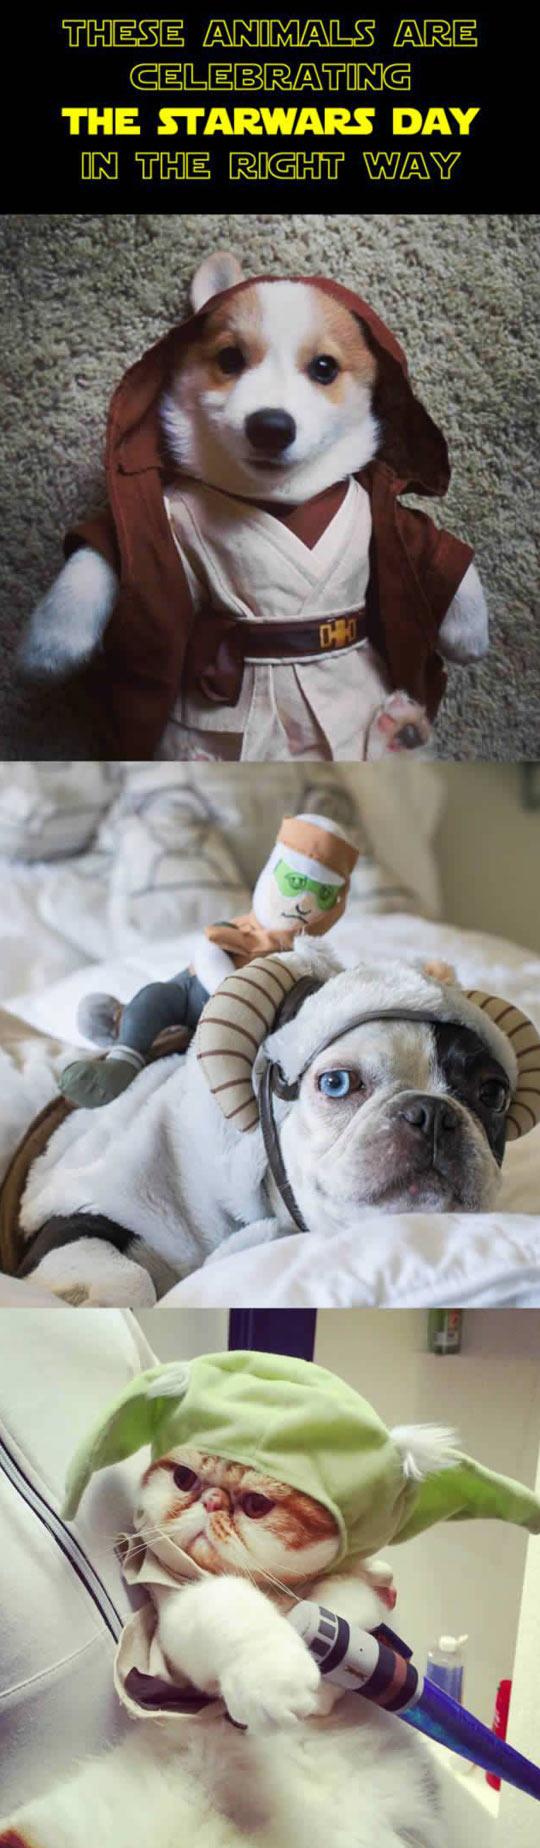 Animals Celebrating The Star Wars Day